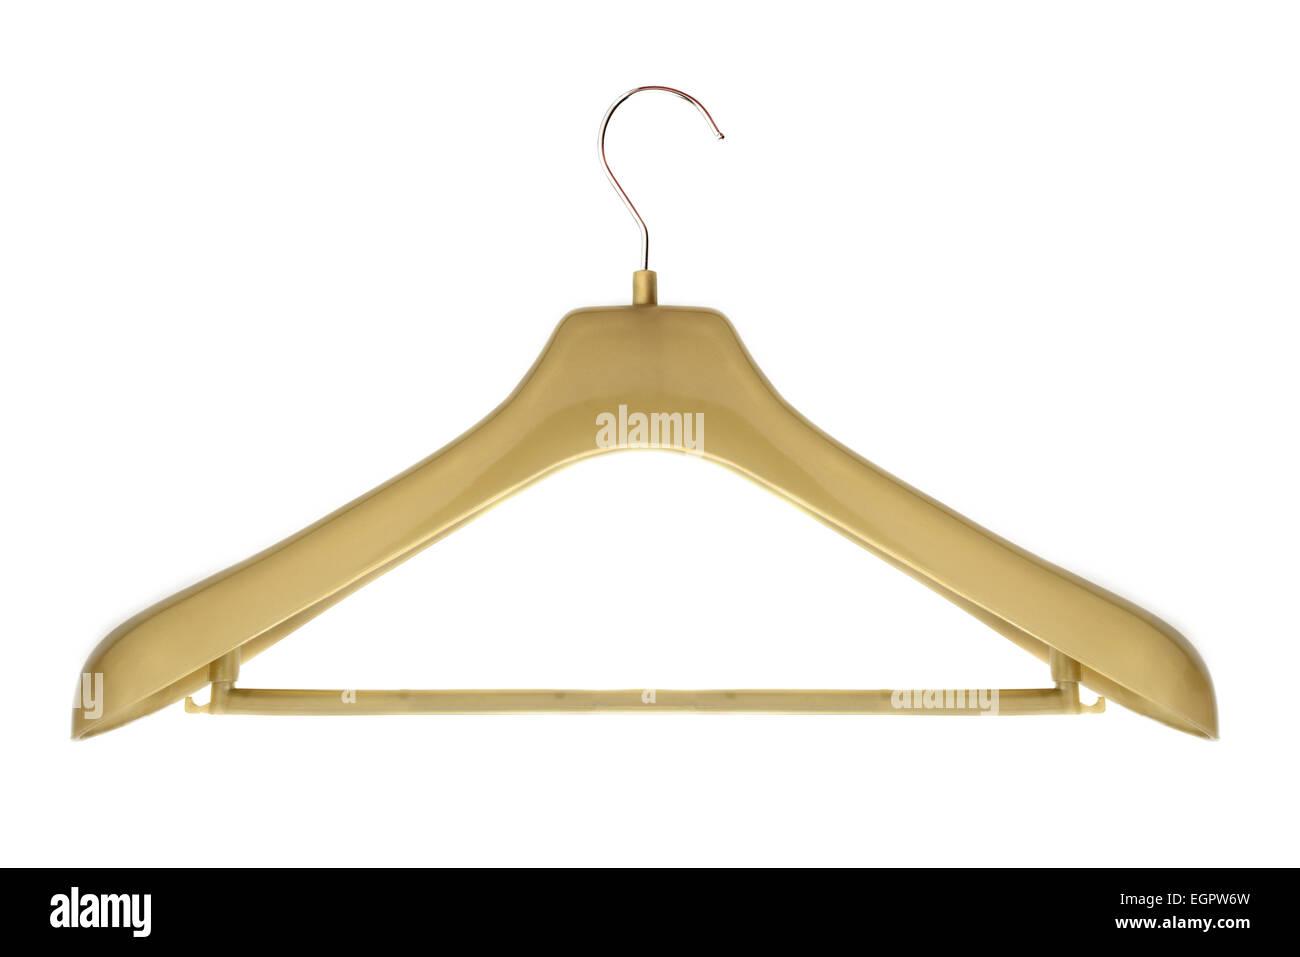 plastic coat hanger isolated on white - Stock Image